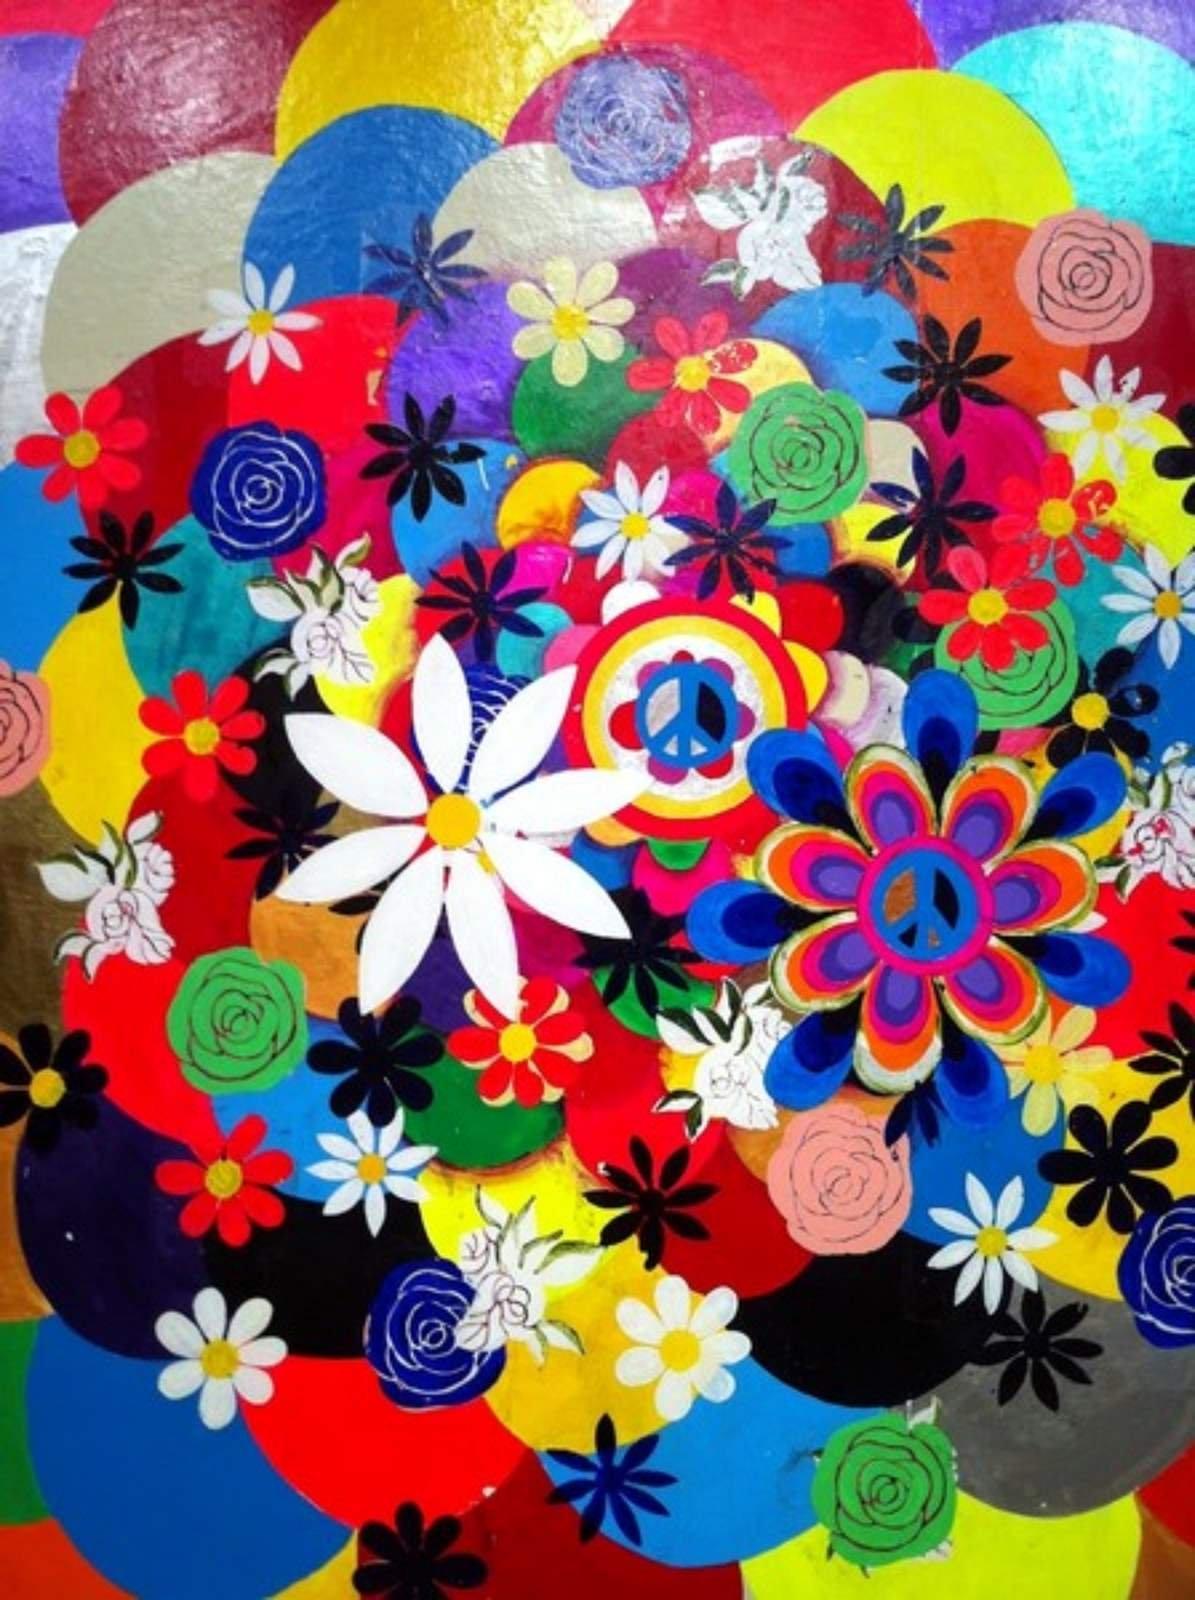 Flowers - Avolona